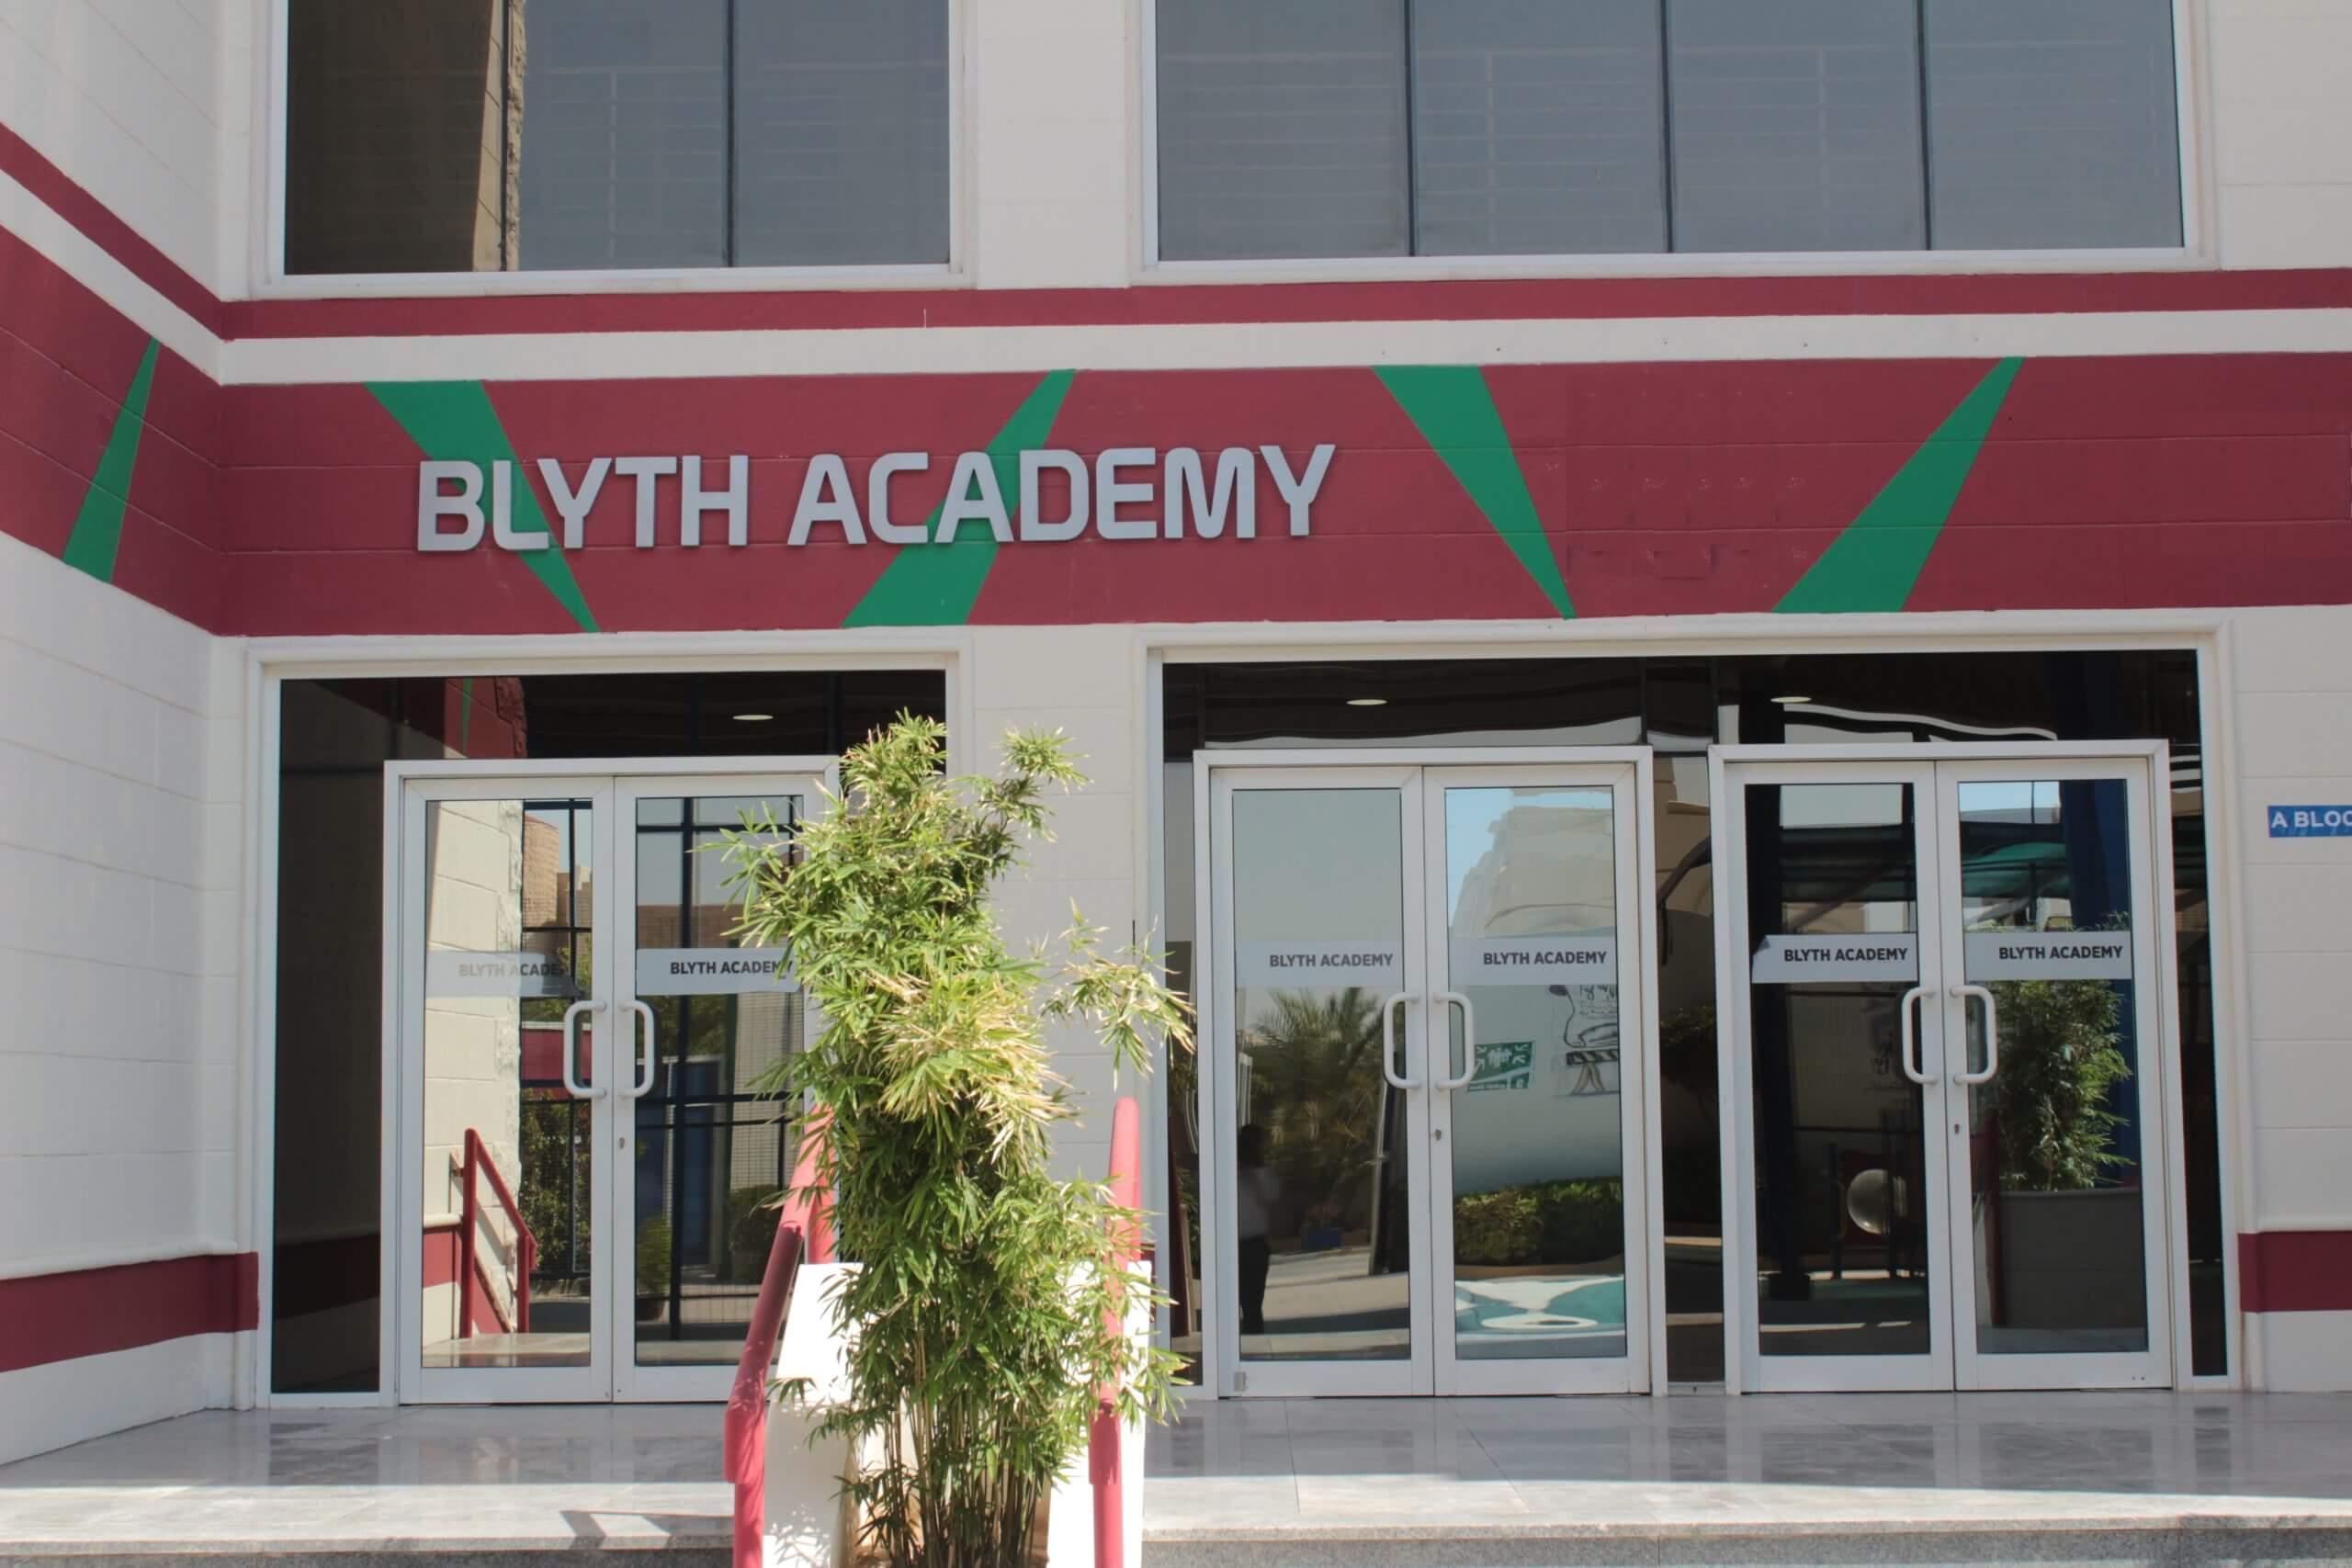 NEW BLYTH CAMPUS